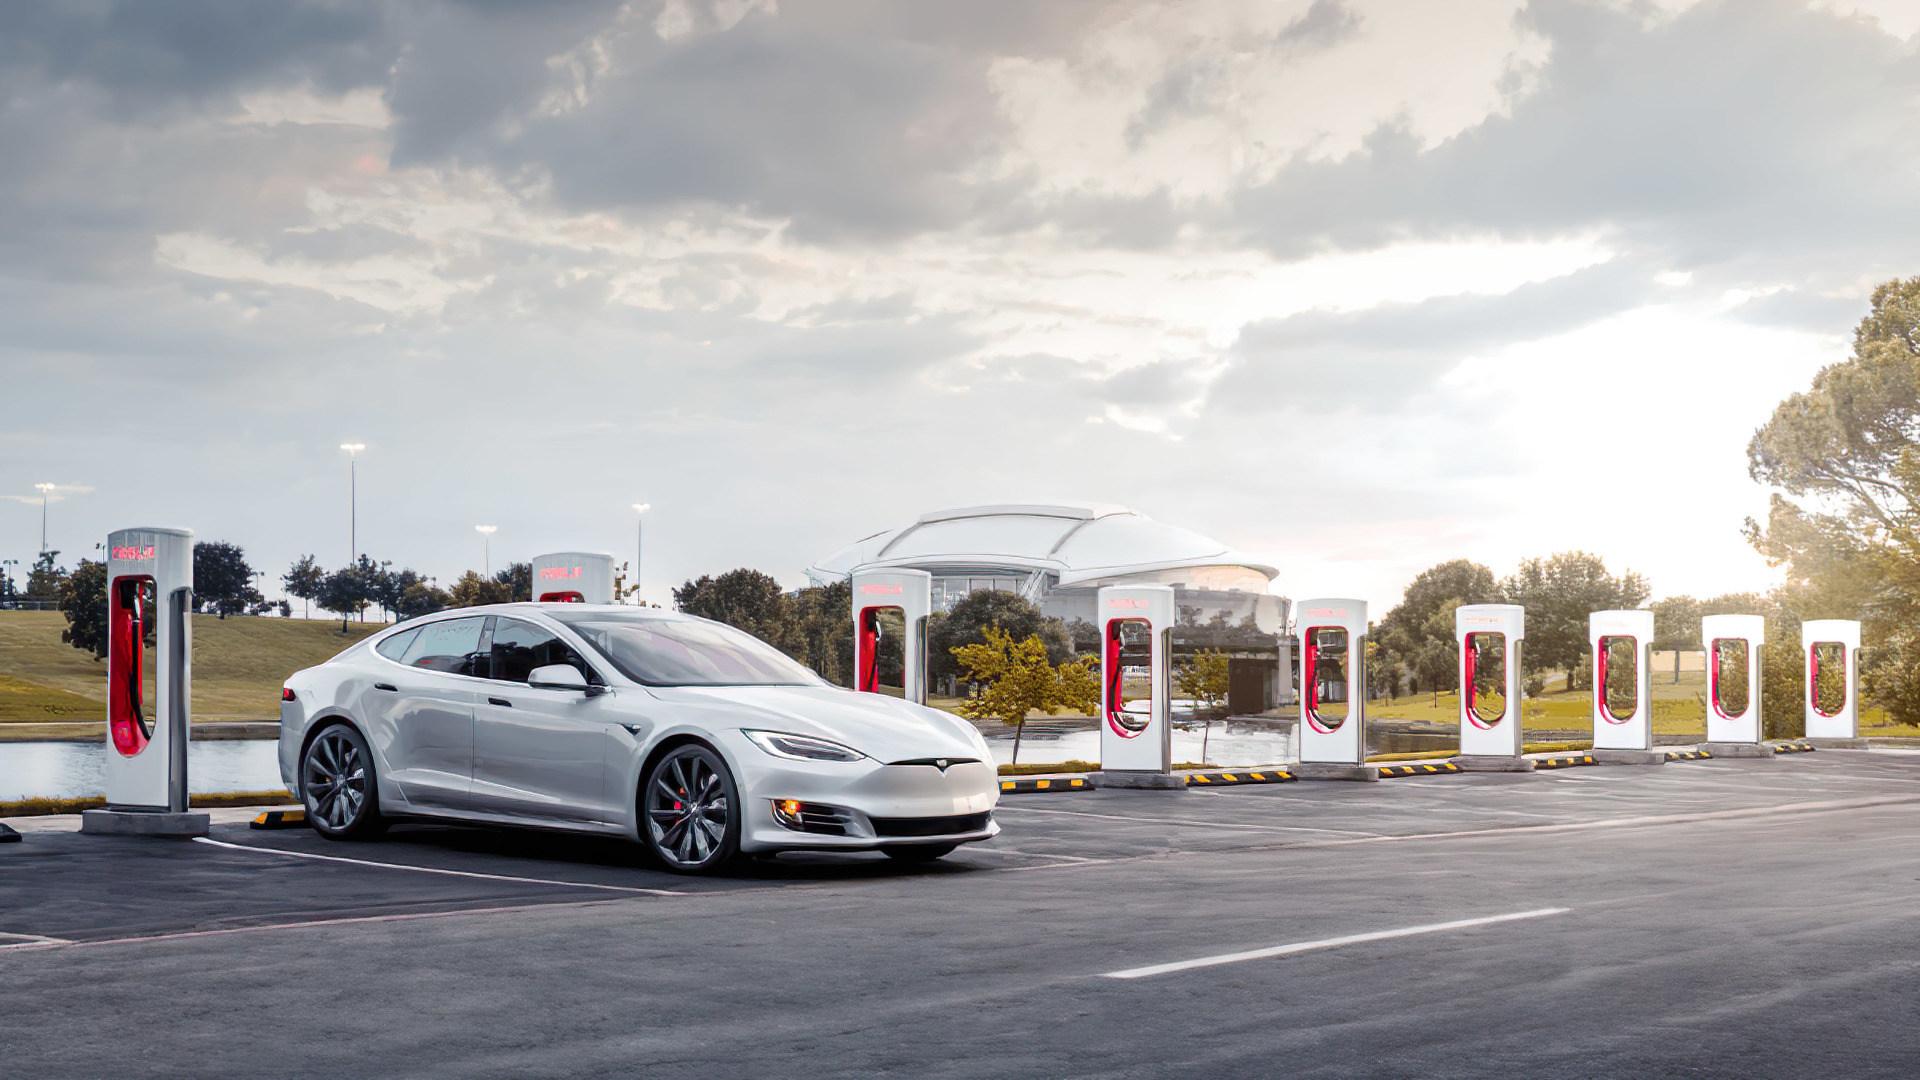 Elektroautos, tesla, Ladestation, Ladesäule, Supercharger